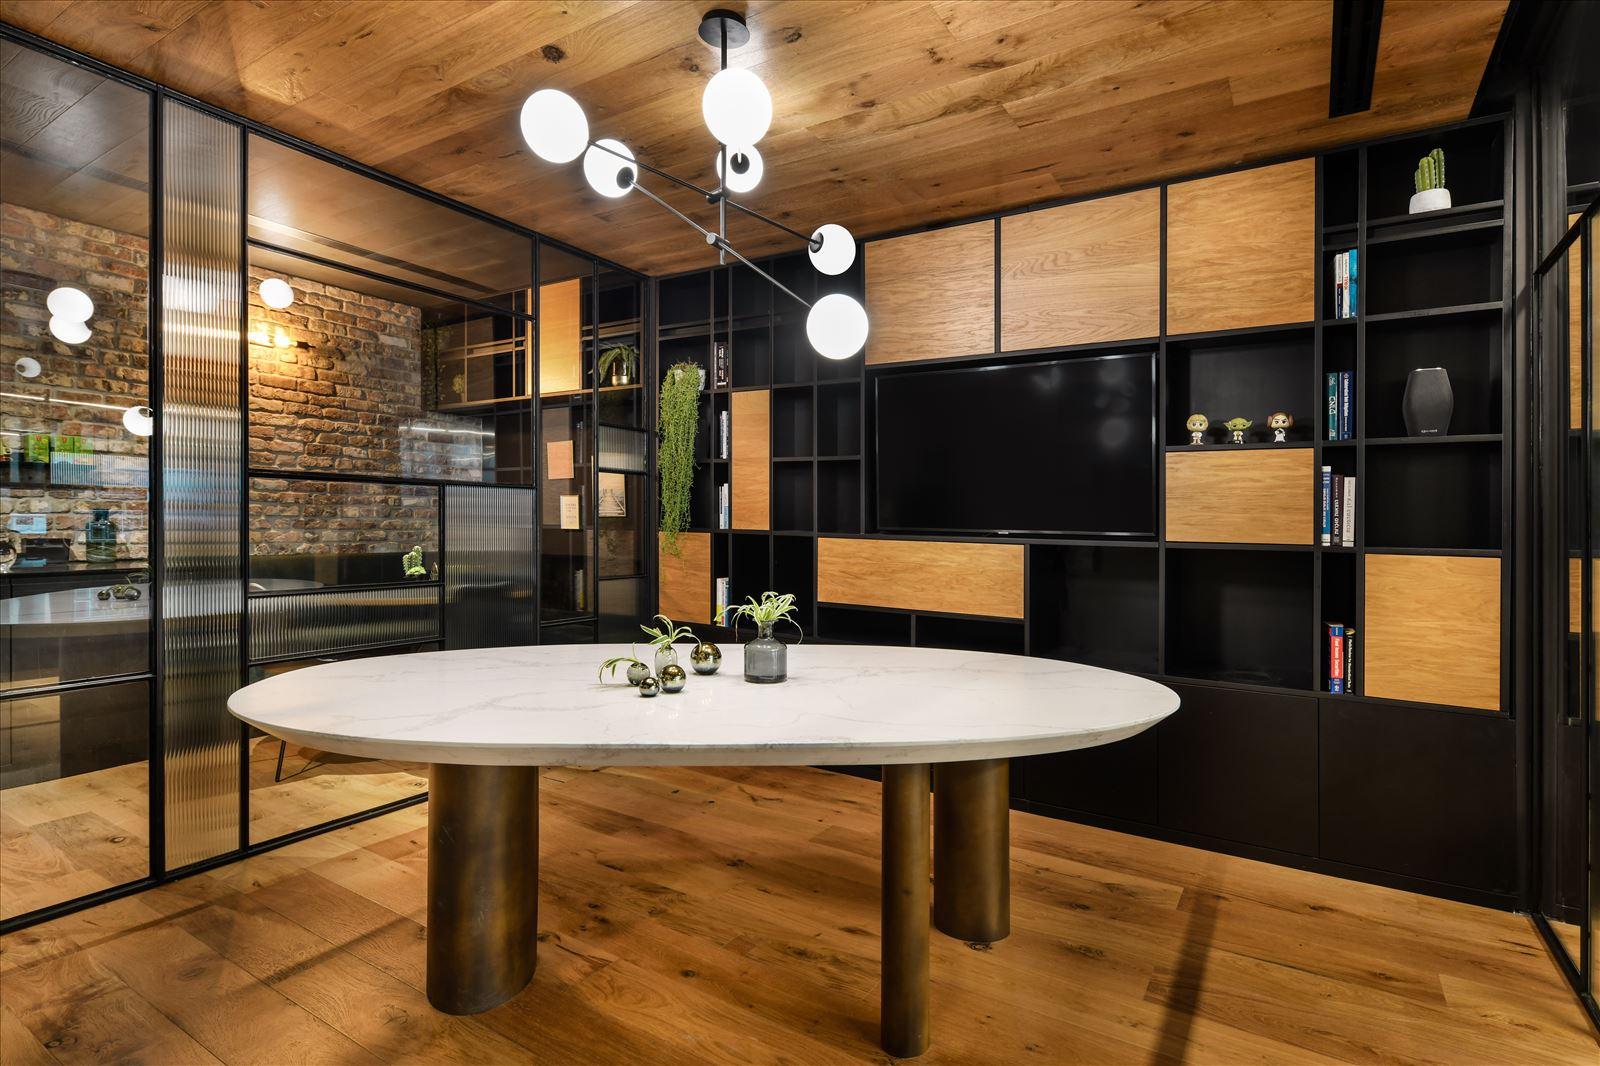 Arbitrage office עיצוב של גוף תאורה המאיר על חלל החדר נעשה על ידי דורי קמחי